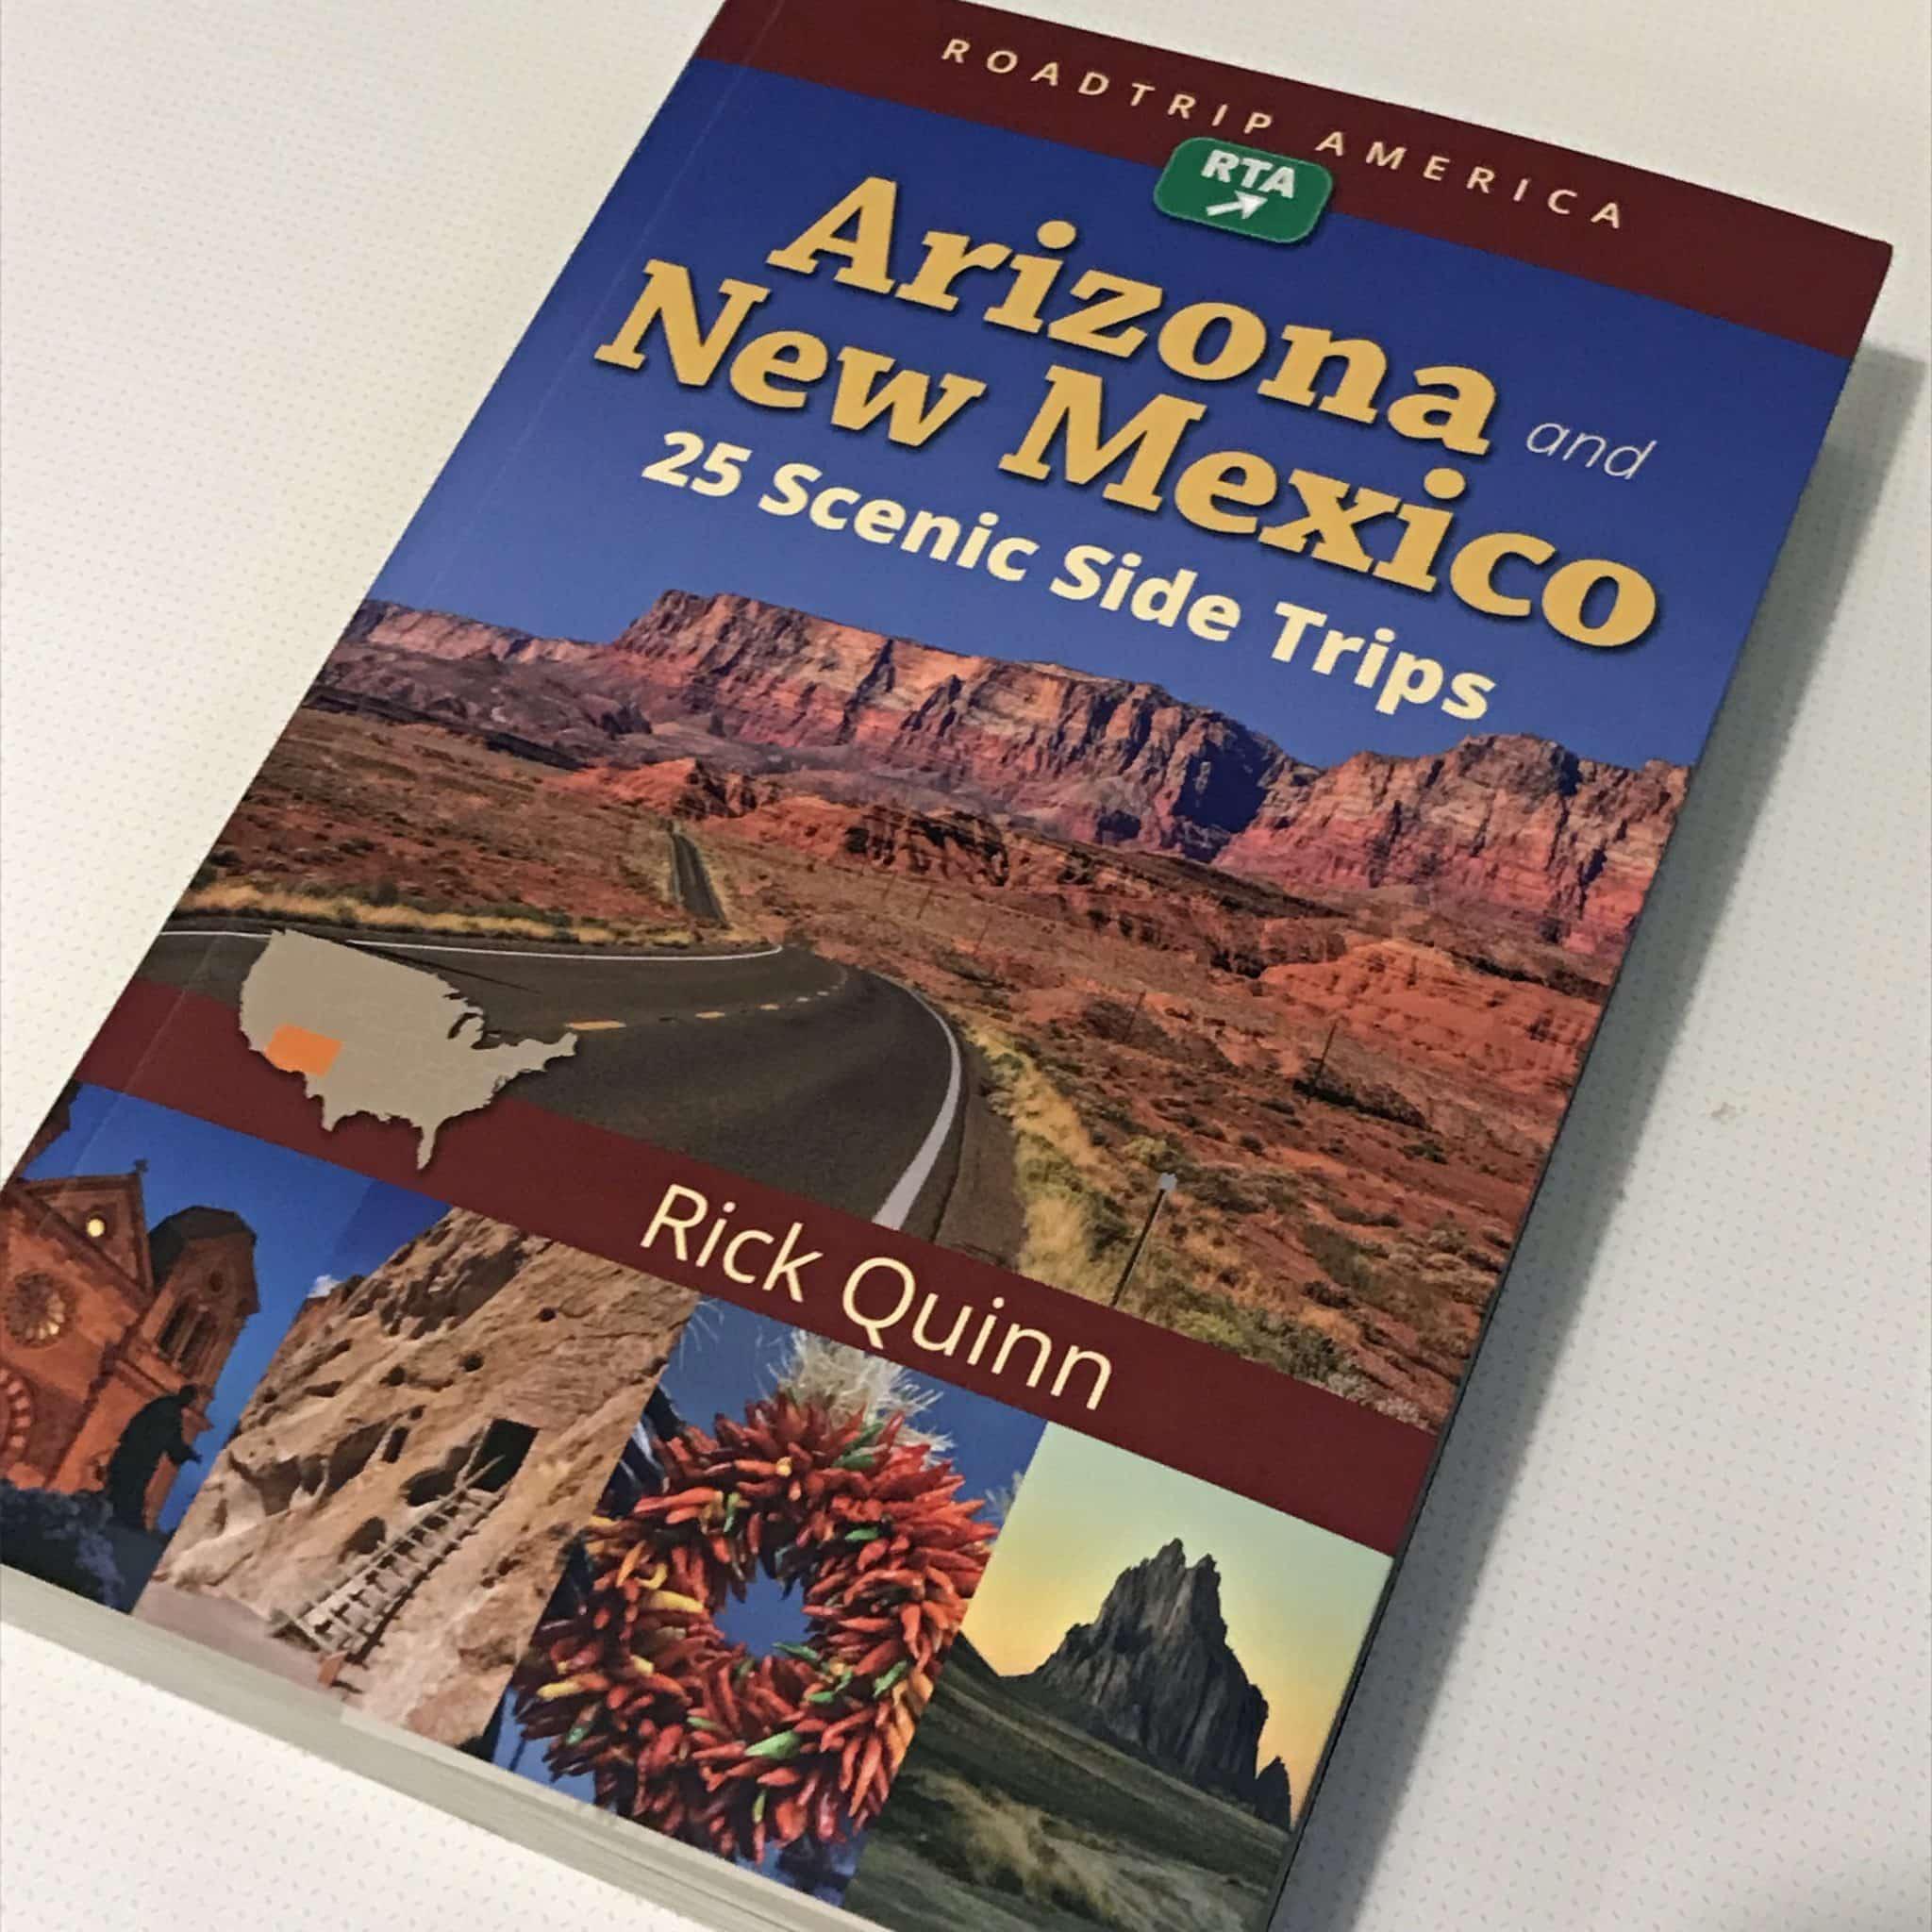 AZ & NM: 25 Scenic Side Trips